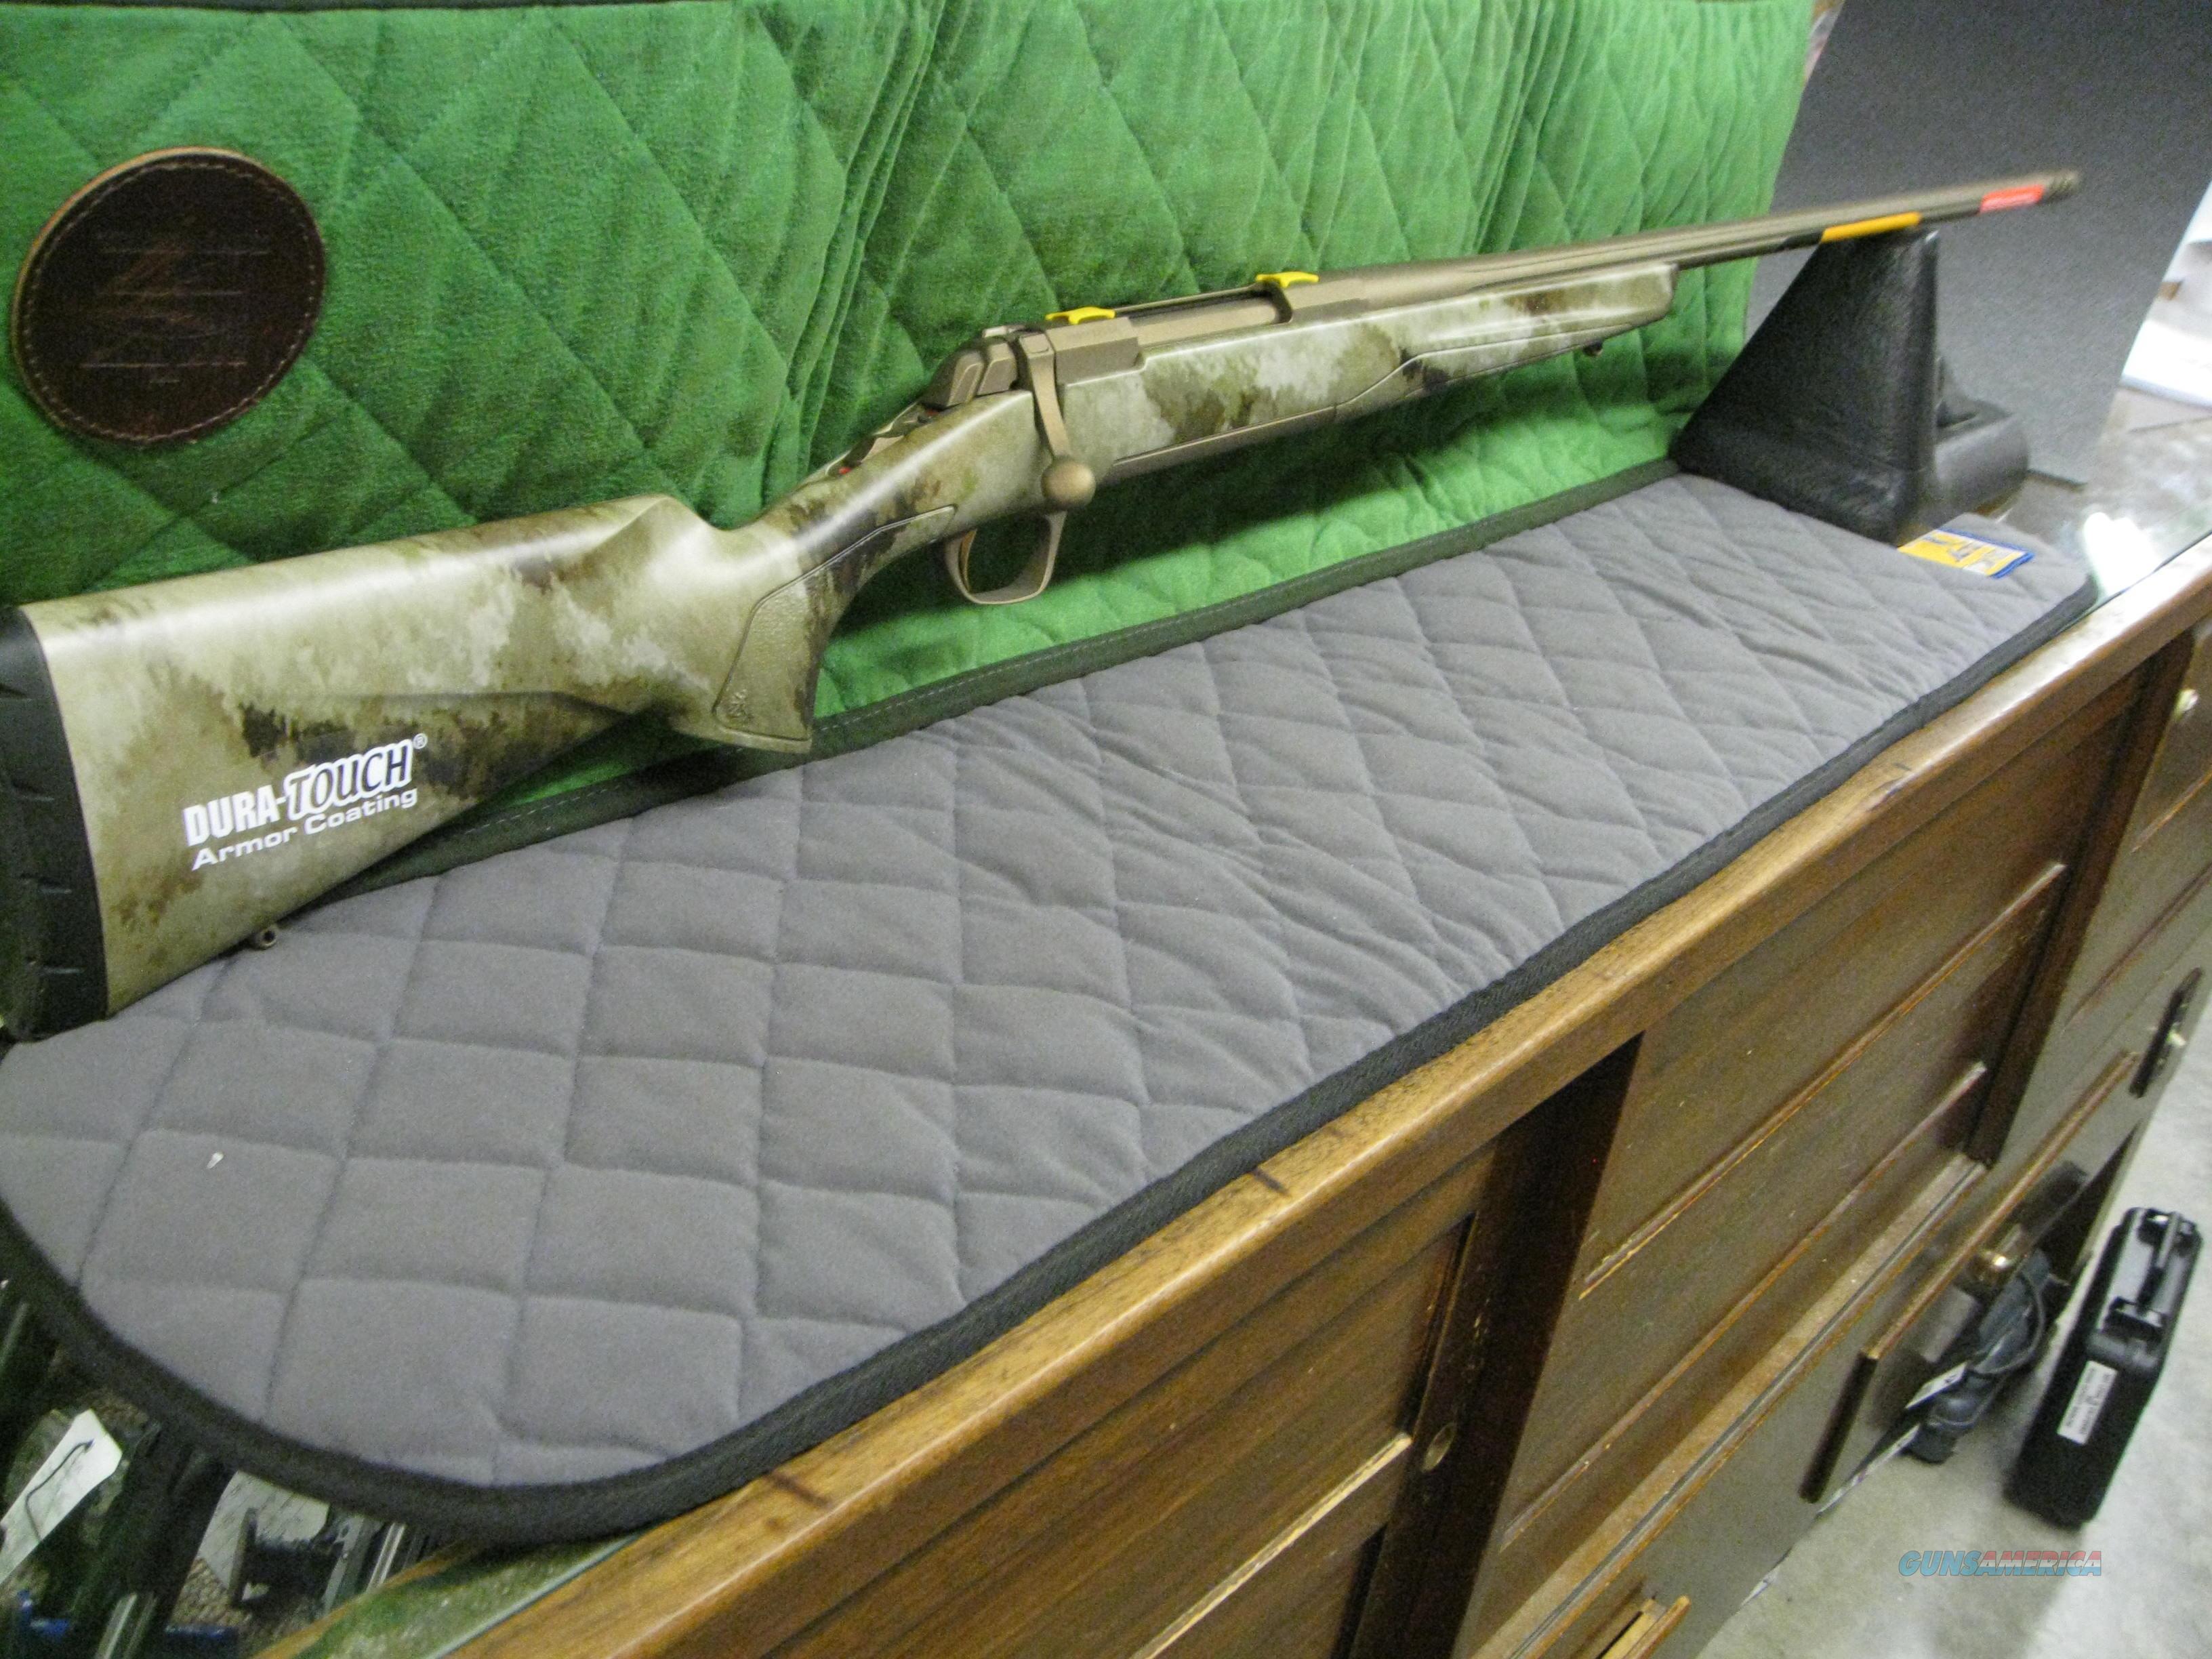 73ccb3706da0e browning x bolt 300 WSM for sale on GunsAmerica. Buy a brown...